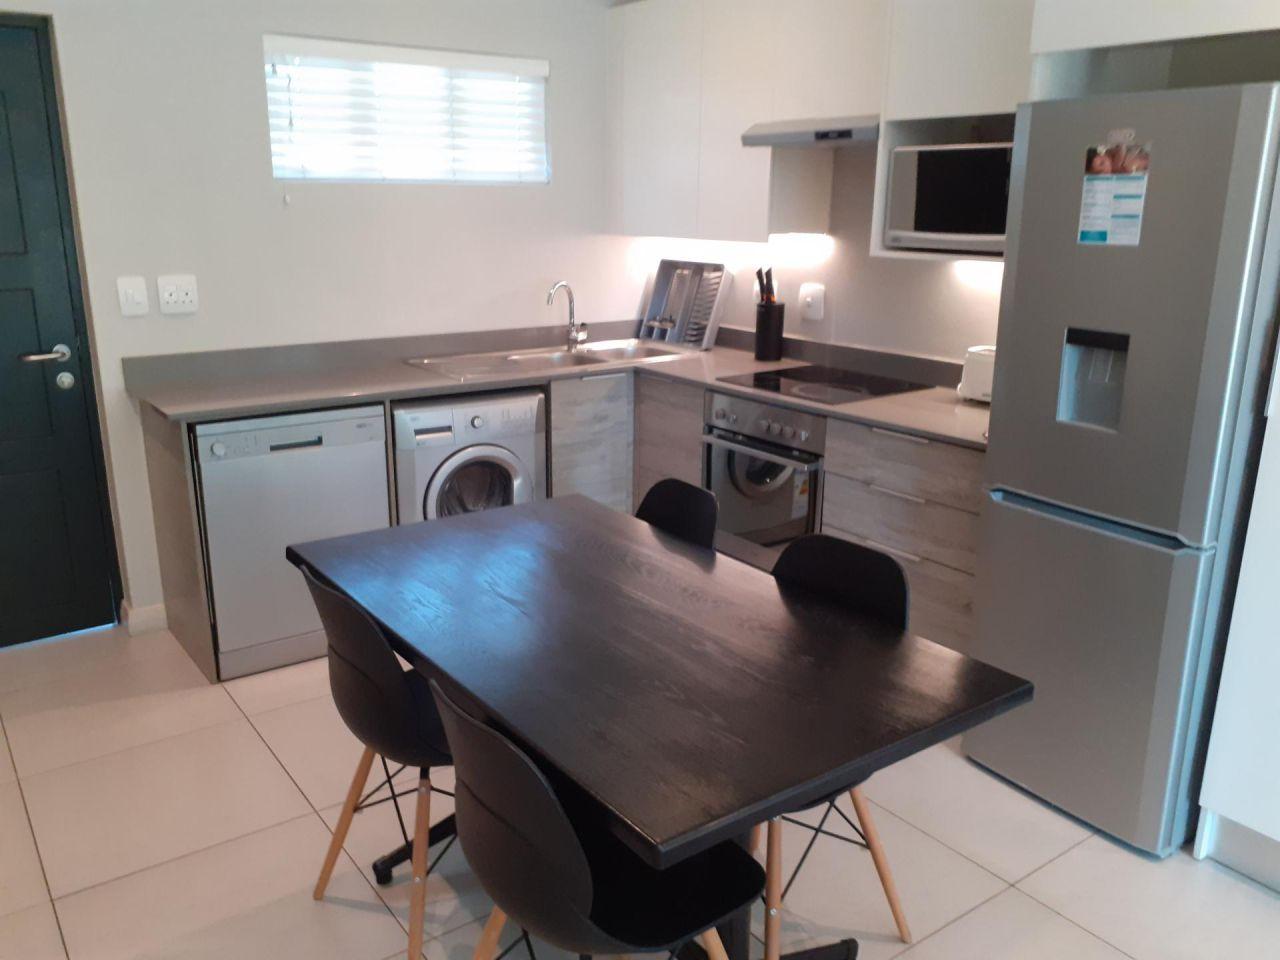 1 Bedroom apartment to rent in Rosebank, Johannesburg